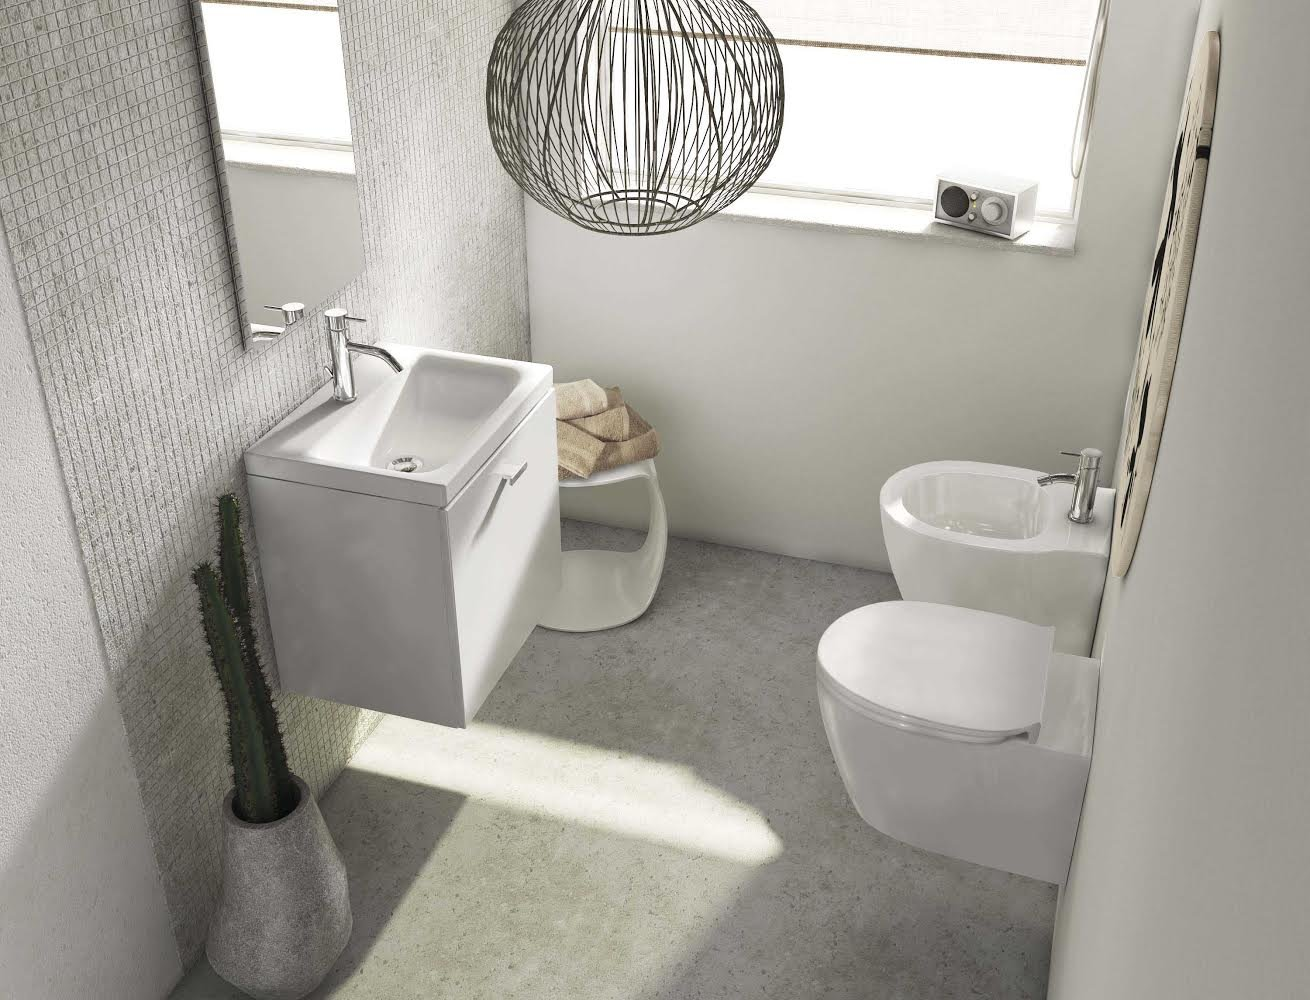 Da ideal standard le soluzioni bagno per tutte le esigenze cose di casa - Camere da bagno ...